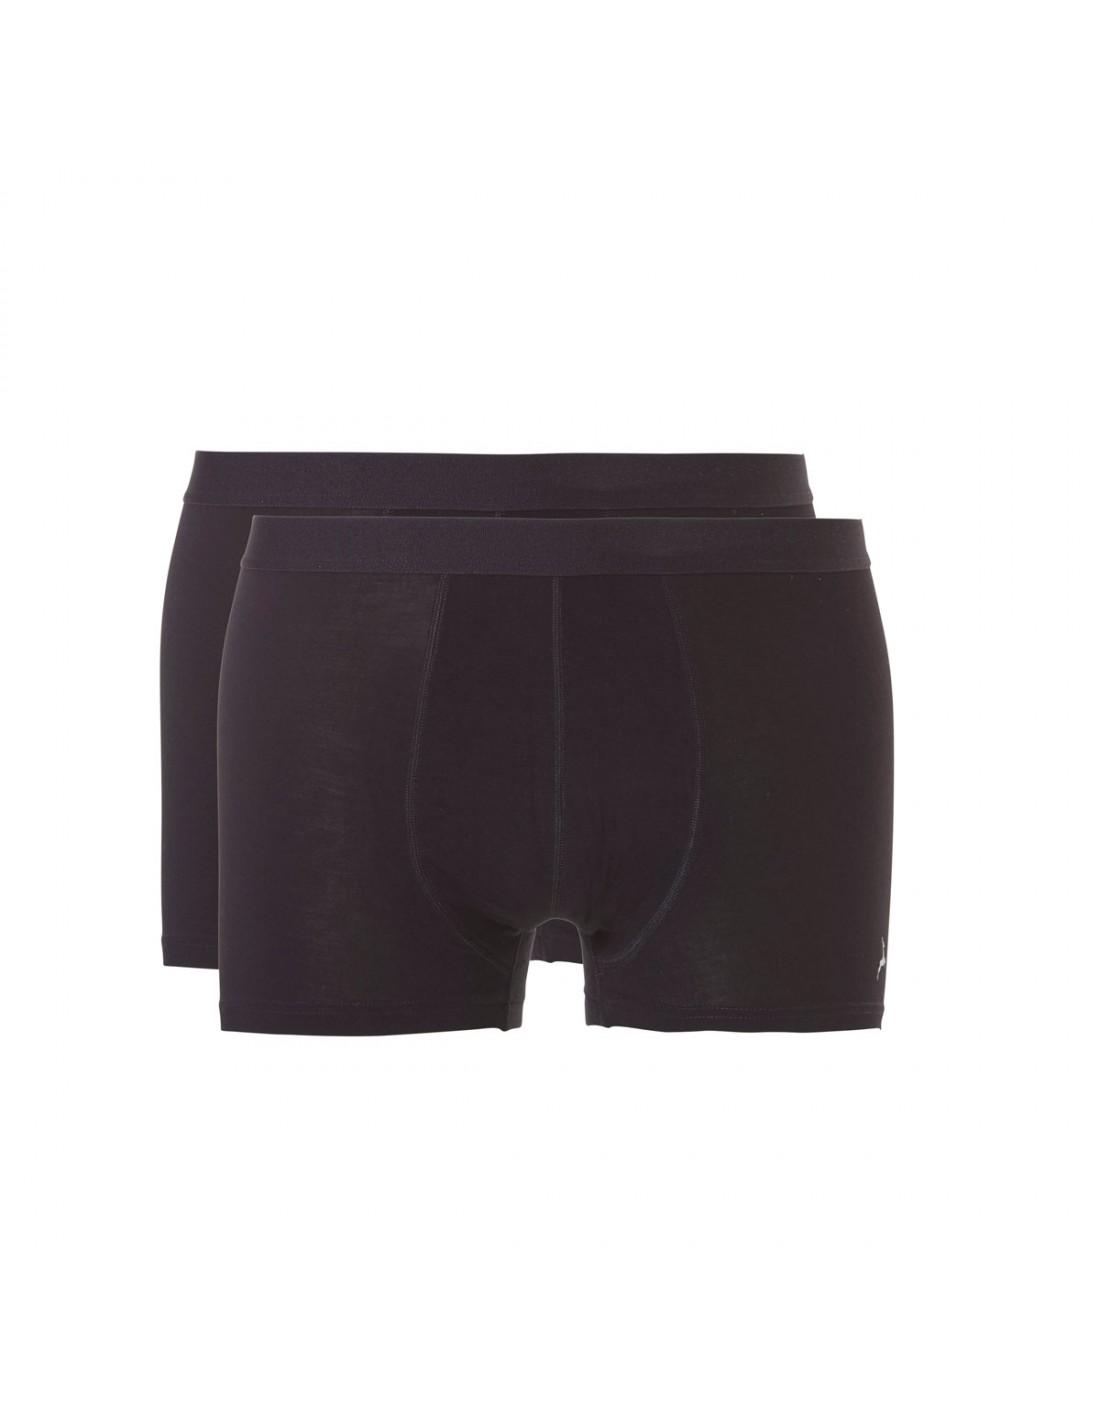 0250ace0ab5 Ten Cate ondergoed Men Bamboo Shorty Boxershort 2Pack Zwart